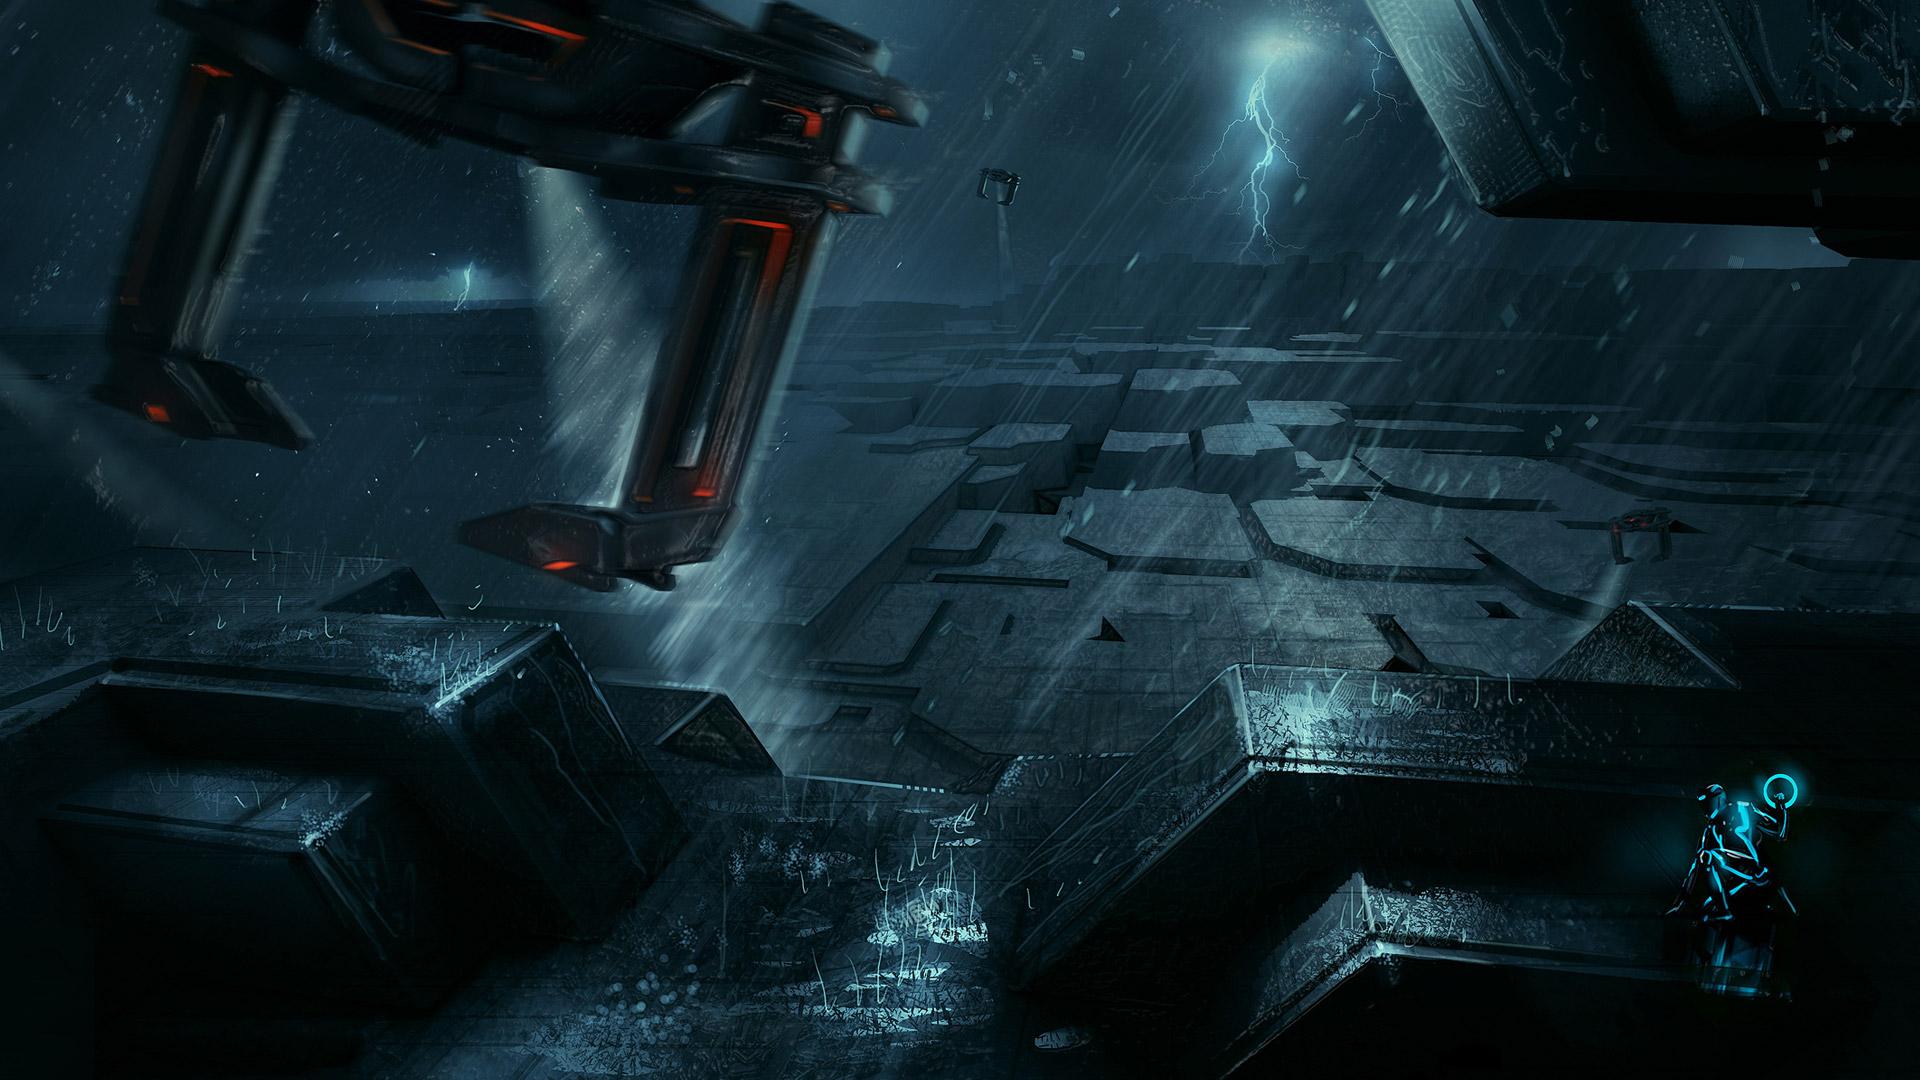 Tron Evolution wallpaper 2